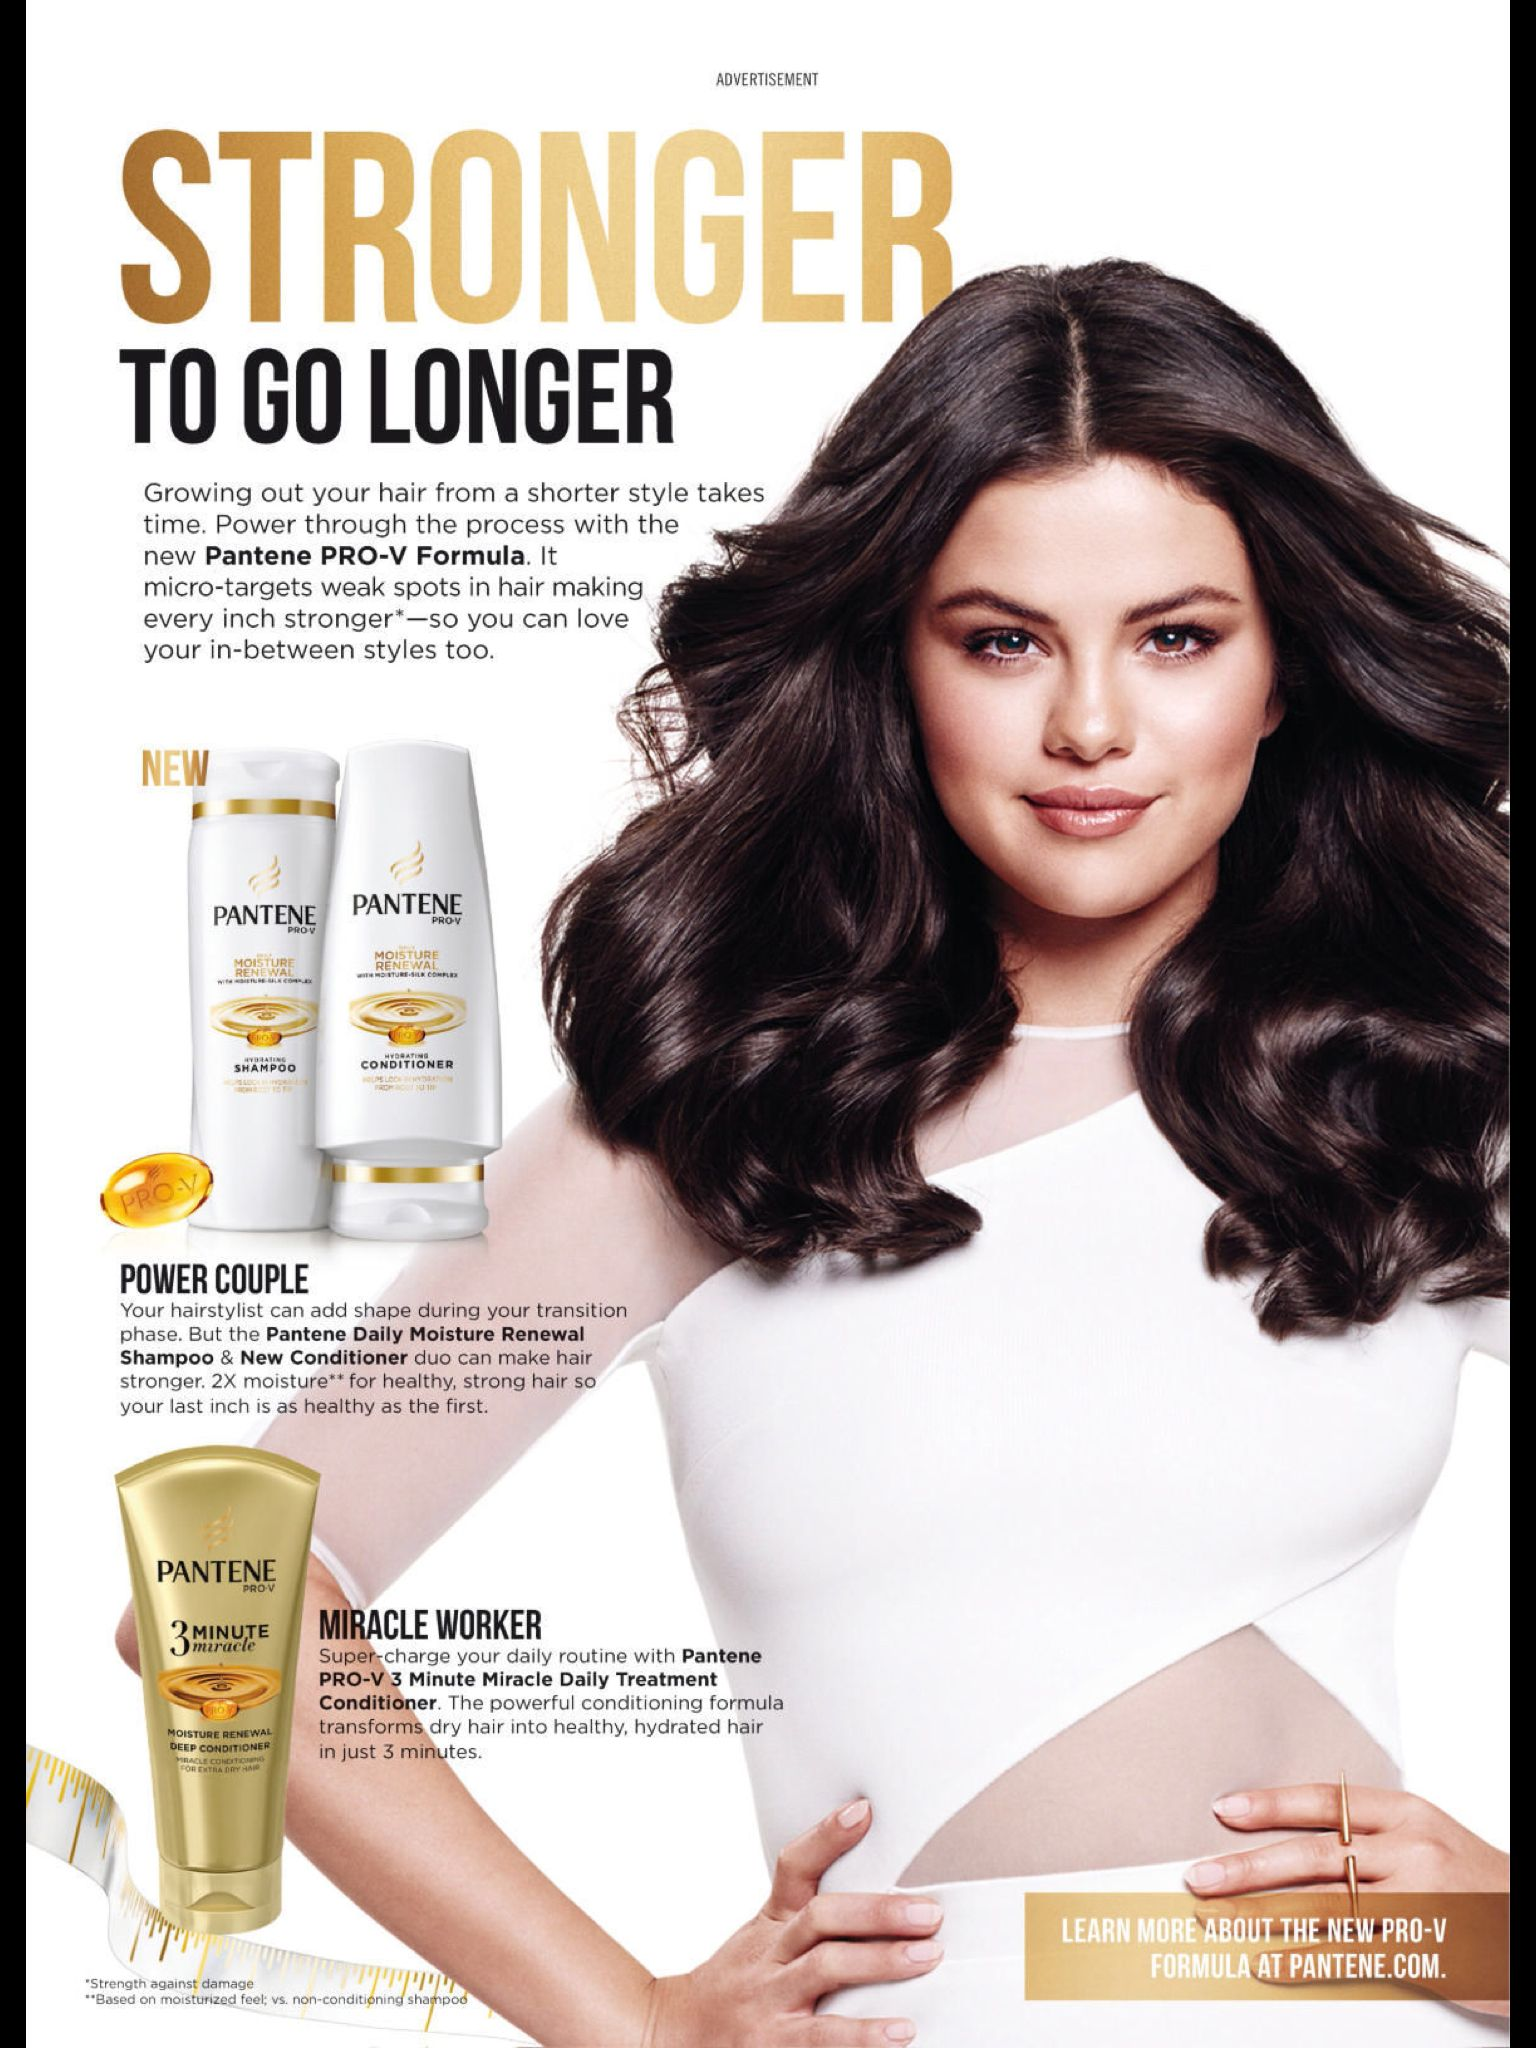 pantene ads ss16 hair styles